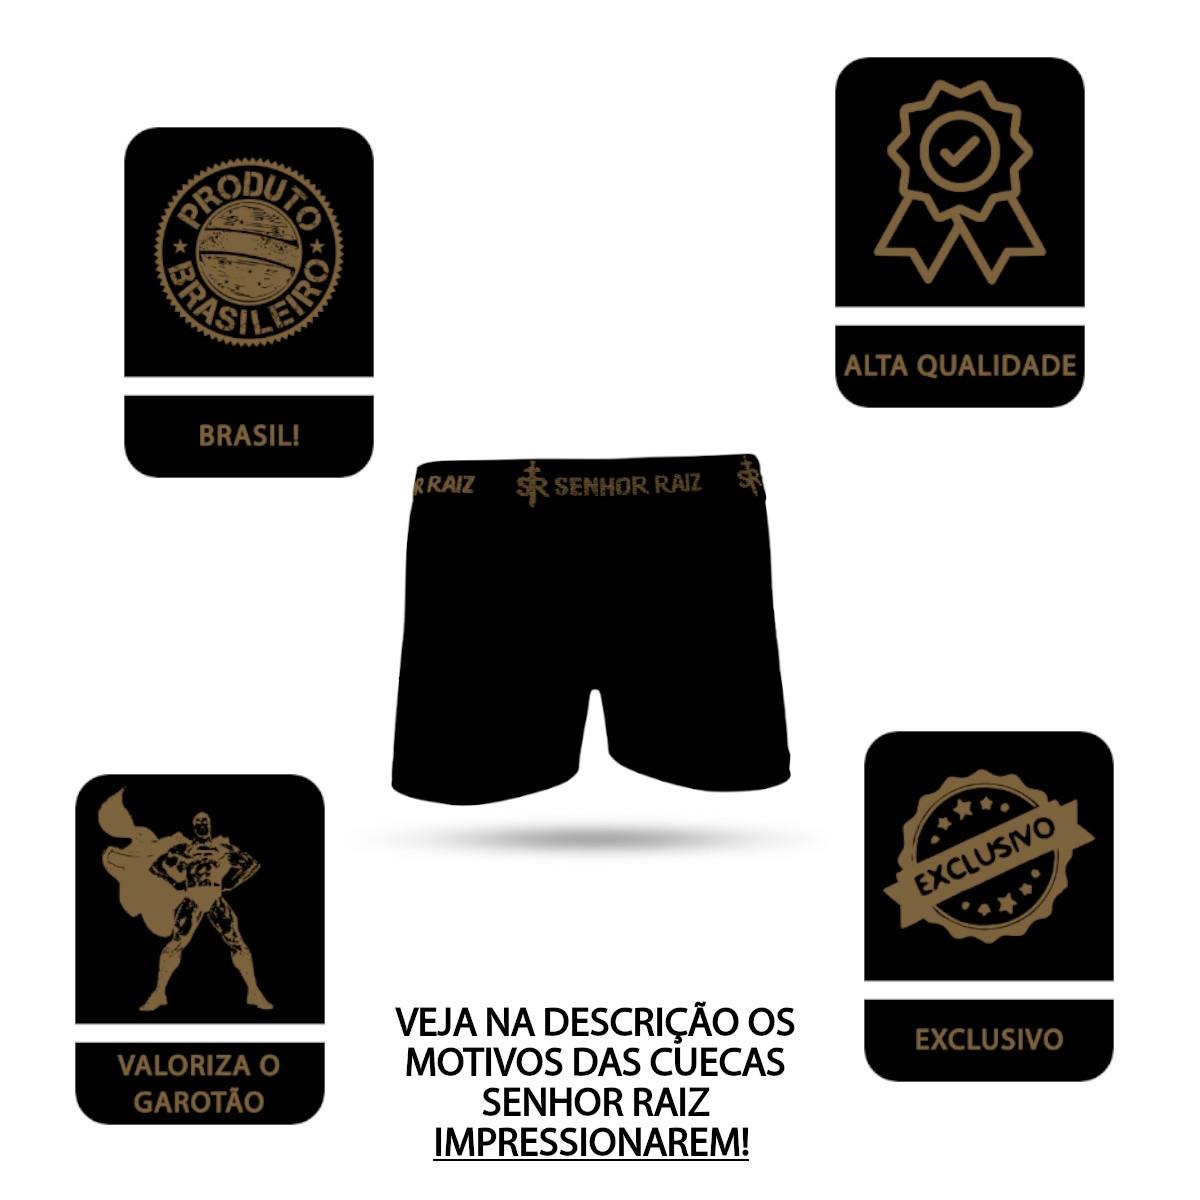 Boxer Temática em Algodão Supremo. Sertanejo - Bota&Chapéu